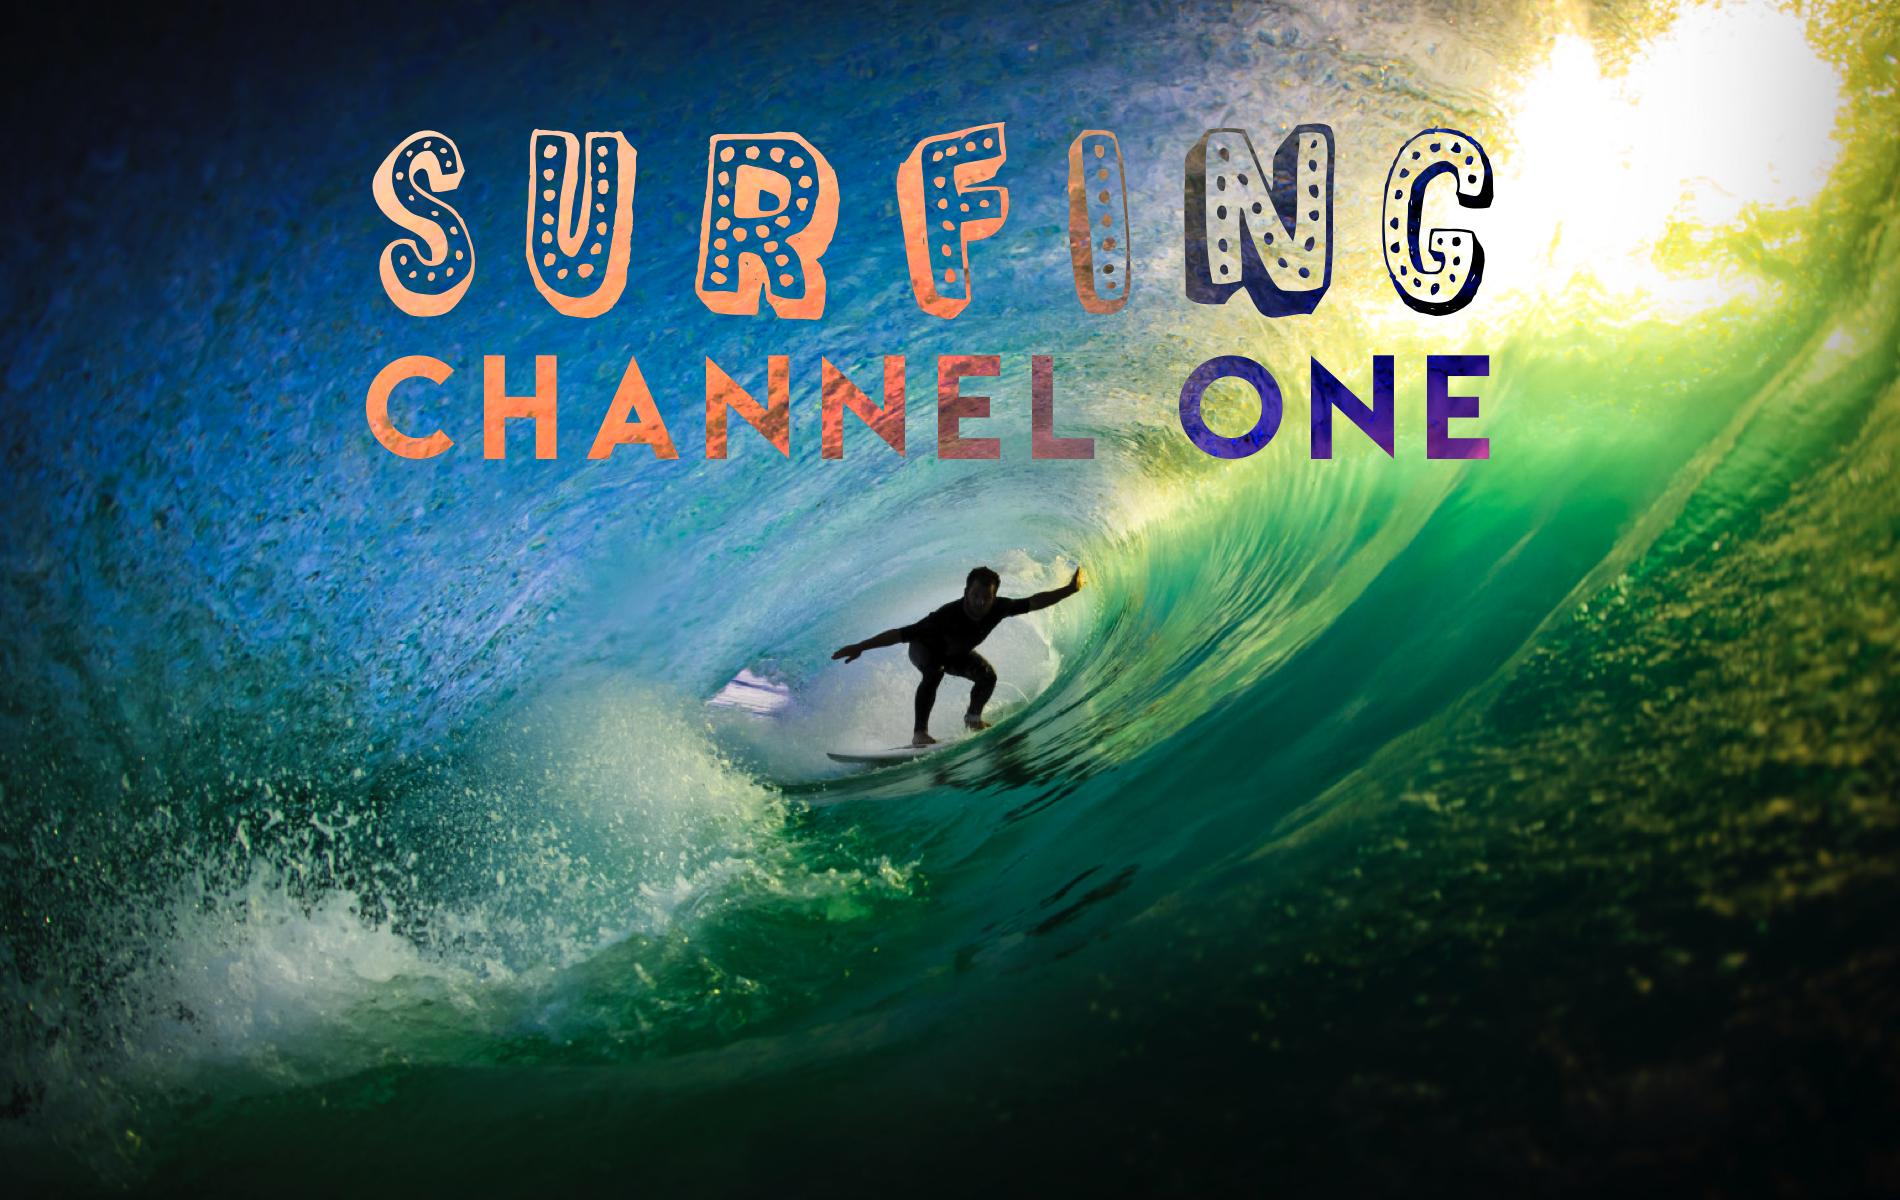 Surfing Channel One  (Grade 5)